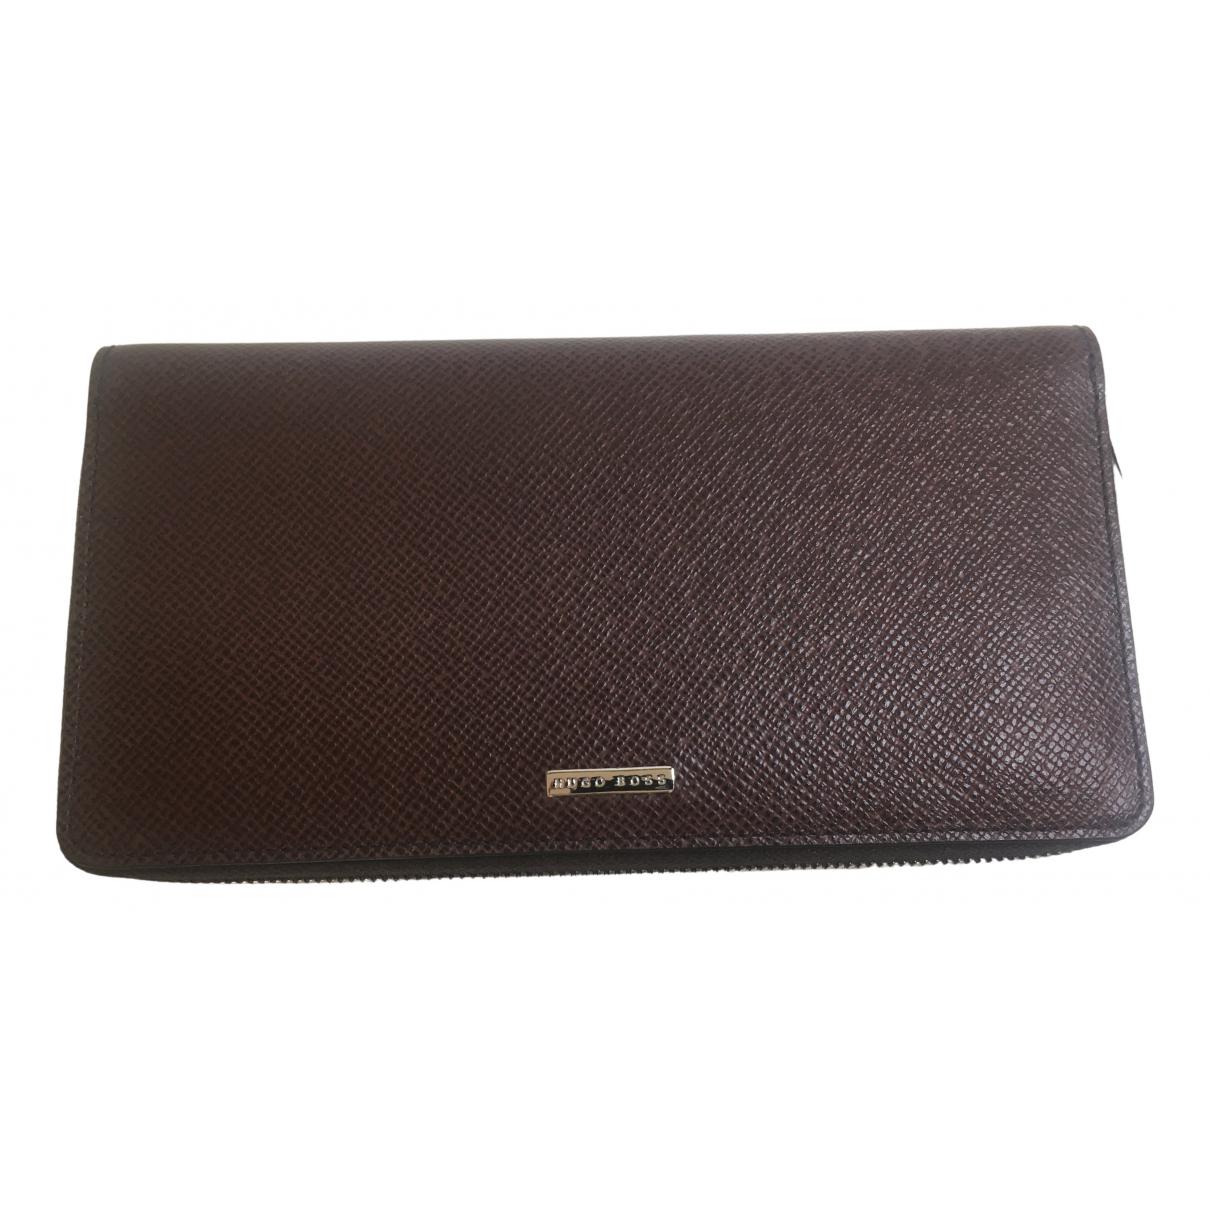 Hugo Boss \N Burgundy Leather wallet for Women \N